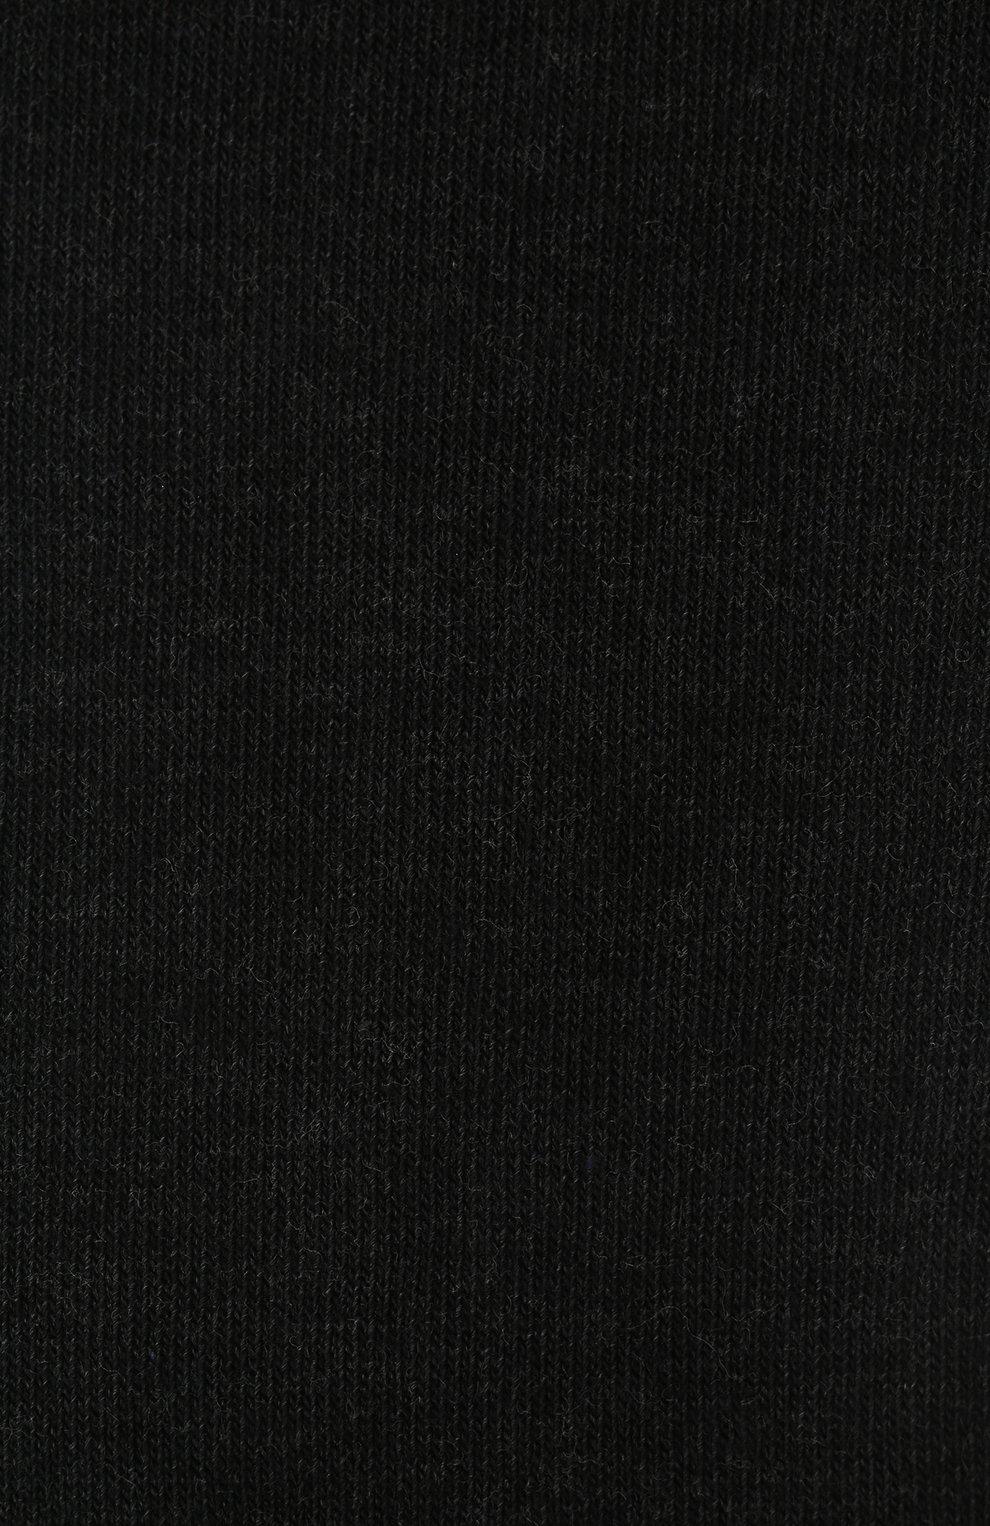 Детские колготки FALKE темно-серого цвета, арт. 13645.   Фото 2